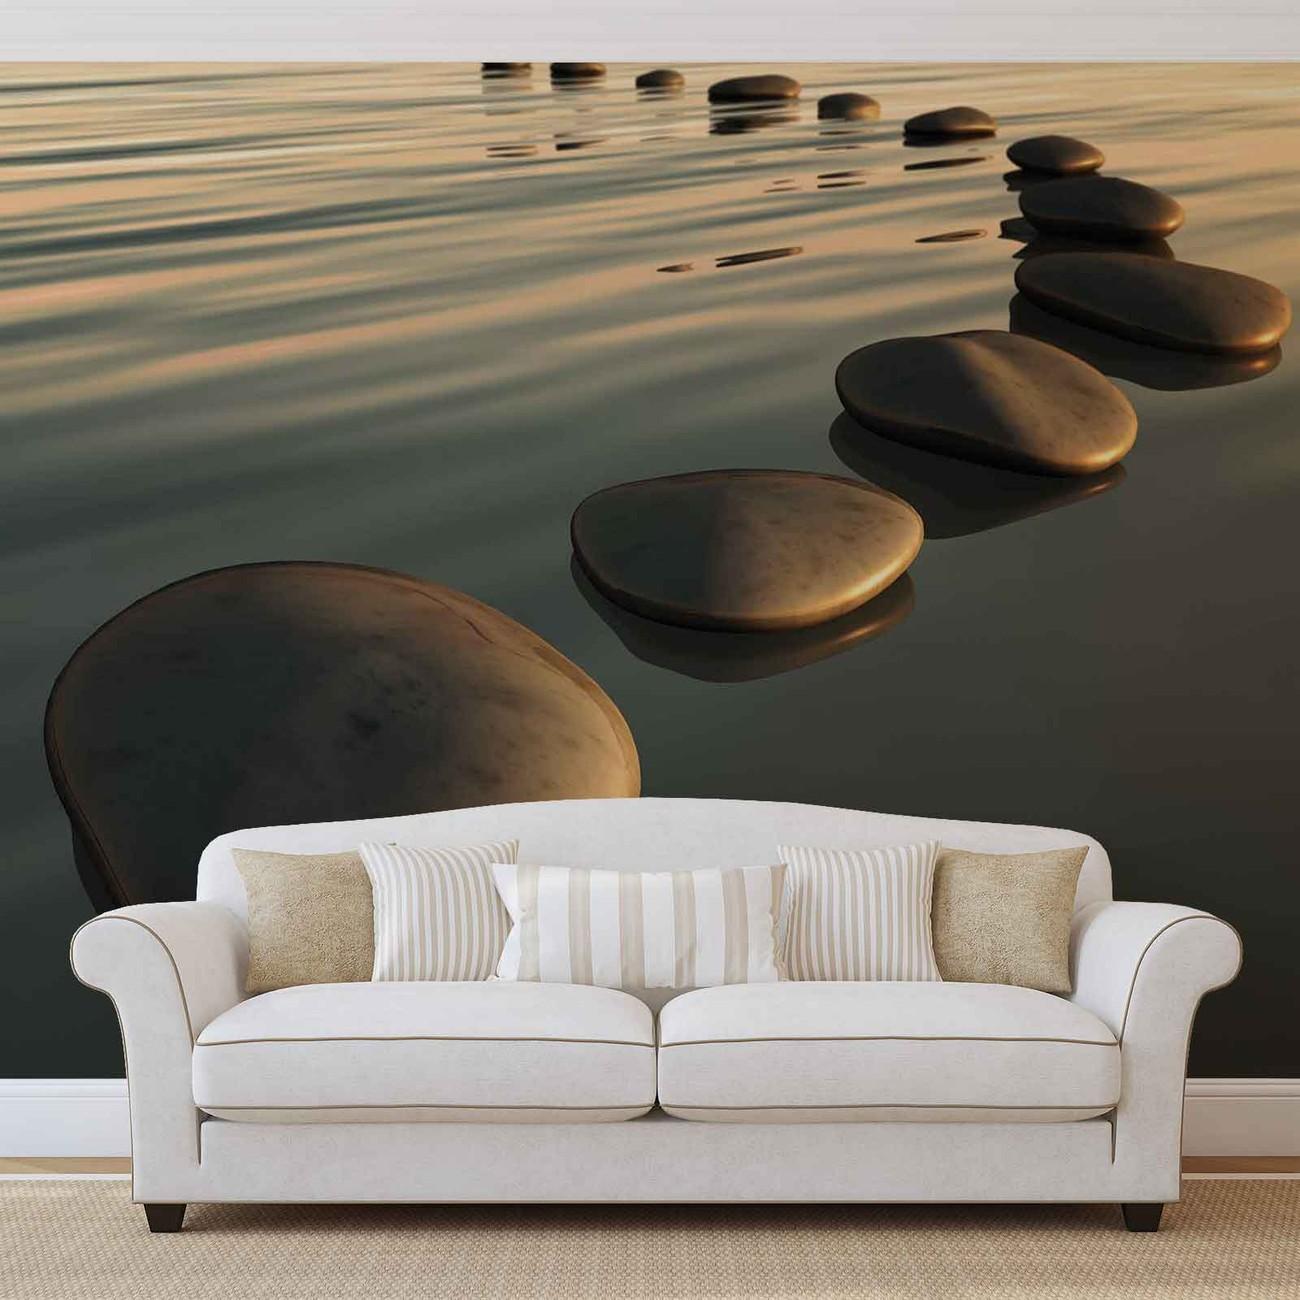 Stones Ripples Zen Wall Paper Mural Buy At Europosters